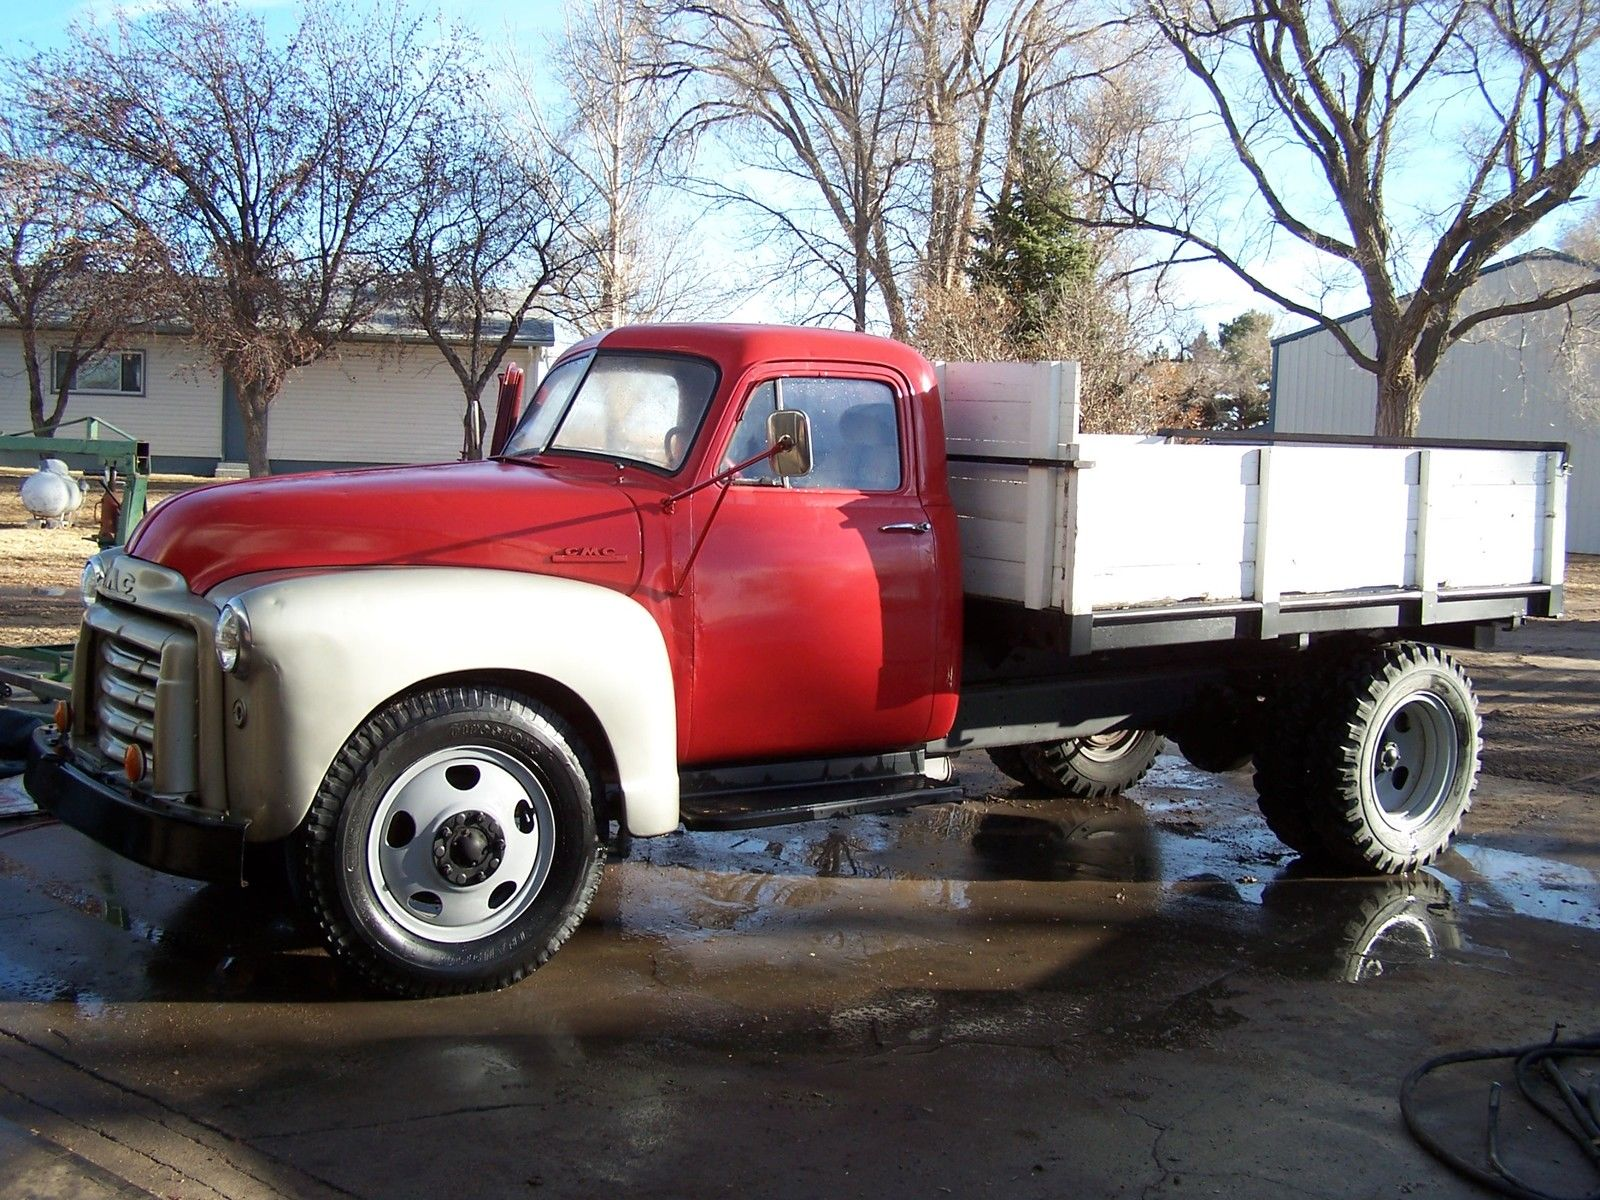 1952 Gmc 2 Ton Dump Truck Looks Runs Shfts Drives Good Nice Old Truck For Sale In Venango Nebraska United States For Sale Photos Technical Specifications Description